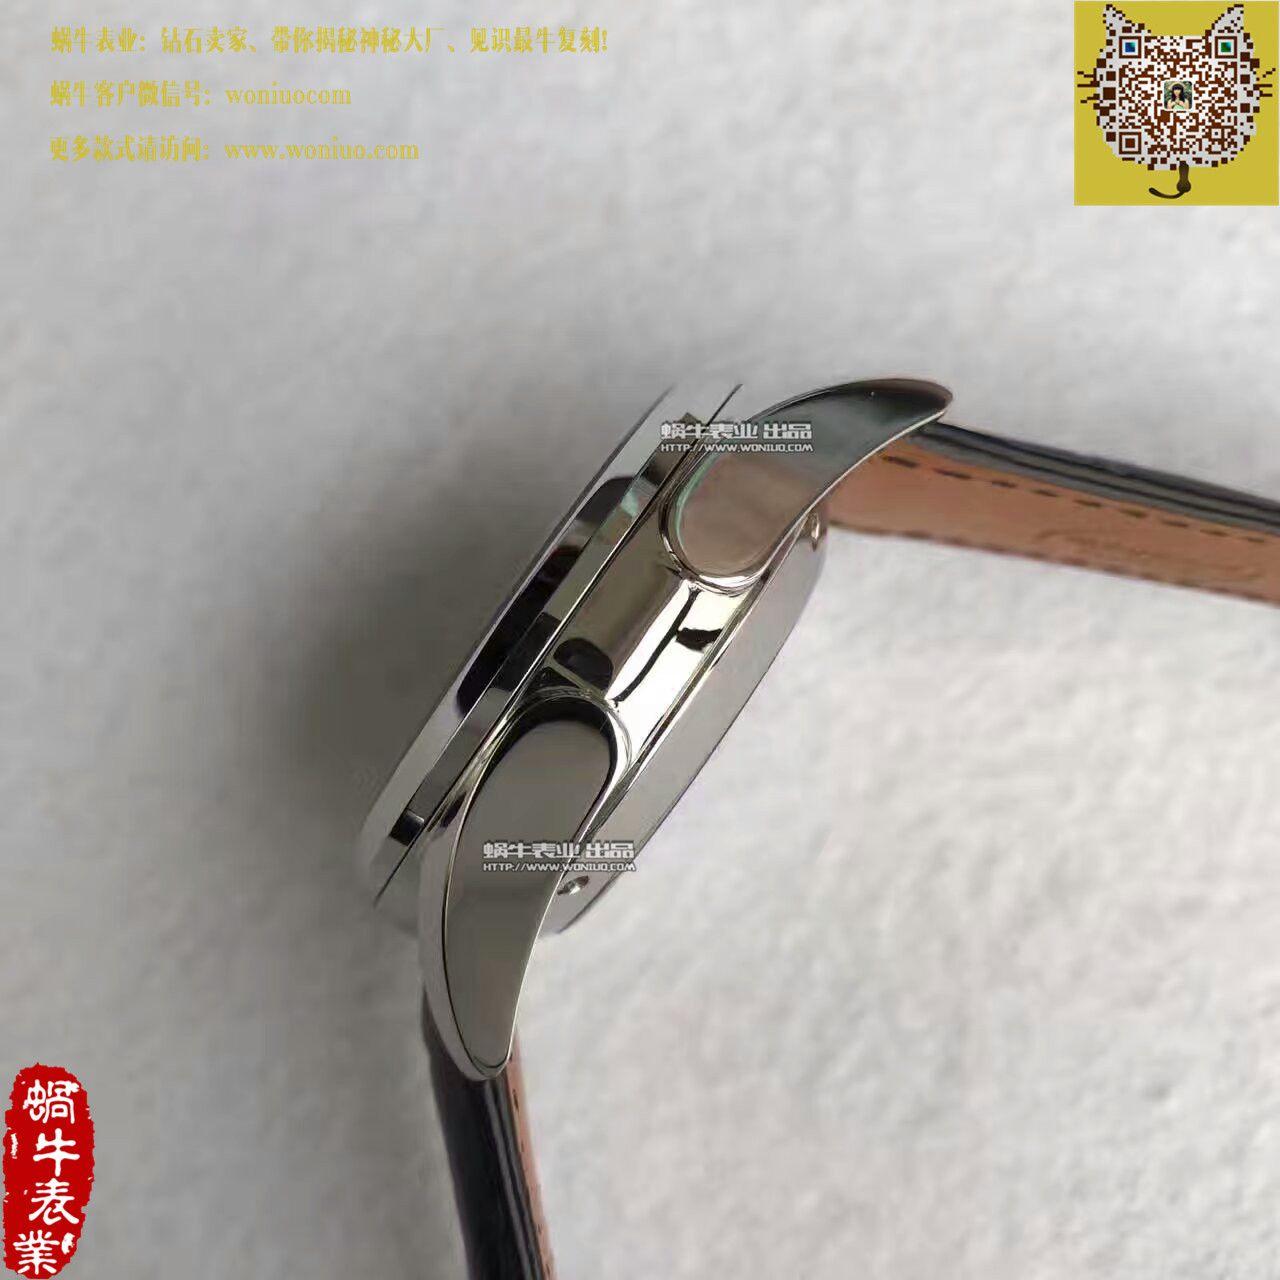 【VF厂一比一复刻手表】帕玛强尼Tonda系列PFC274-0001401-HE1442腕表 / PM028